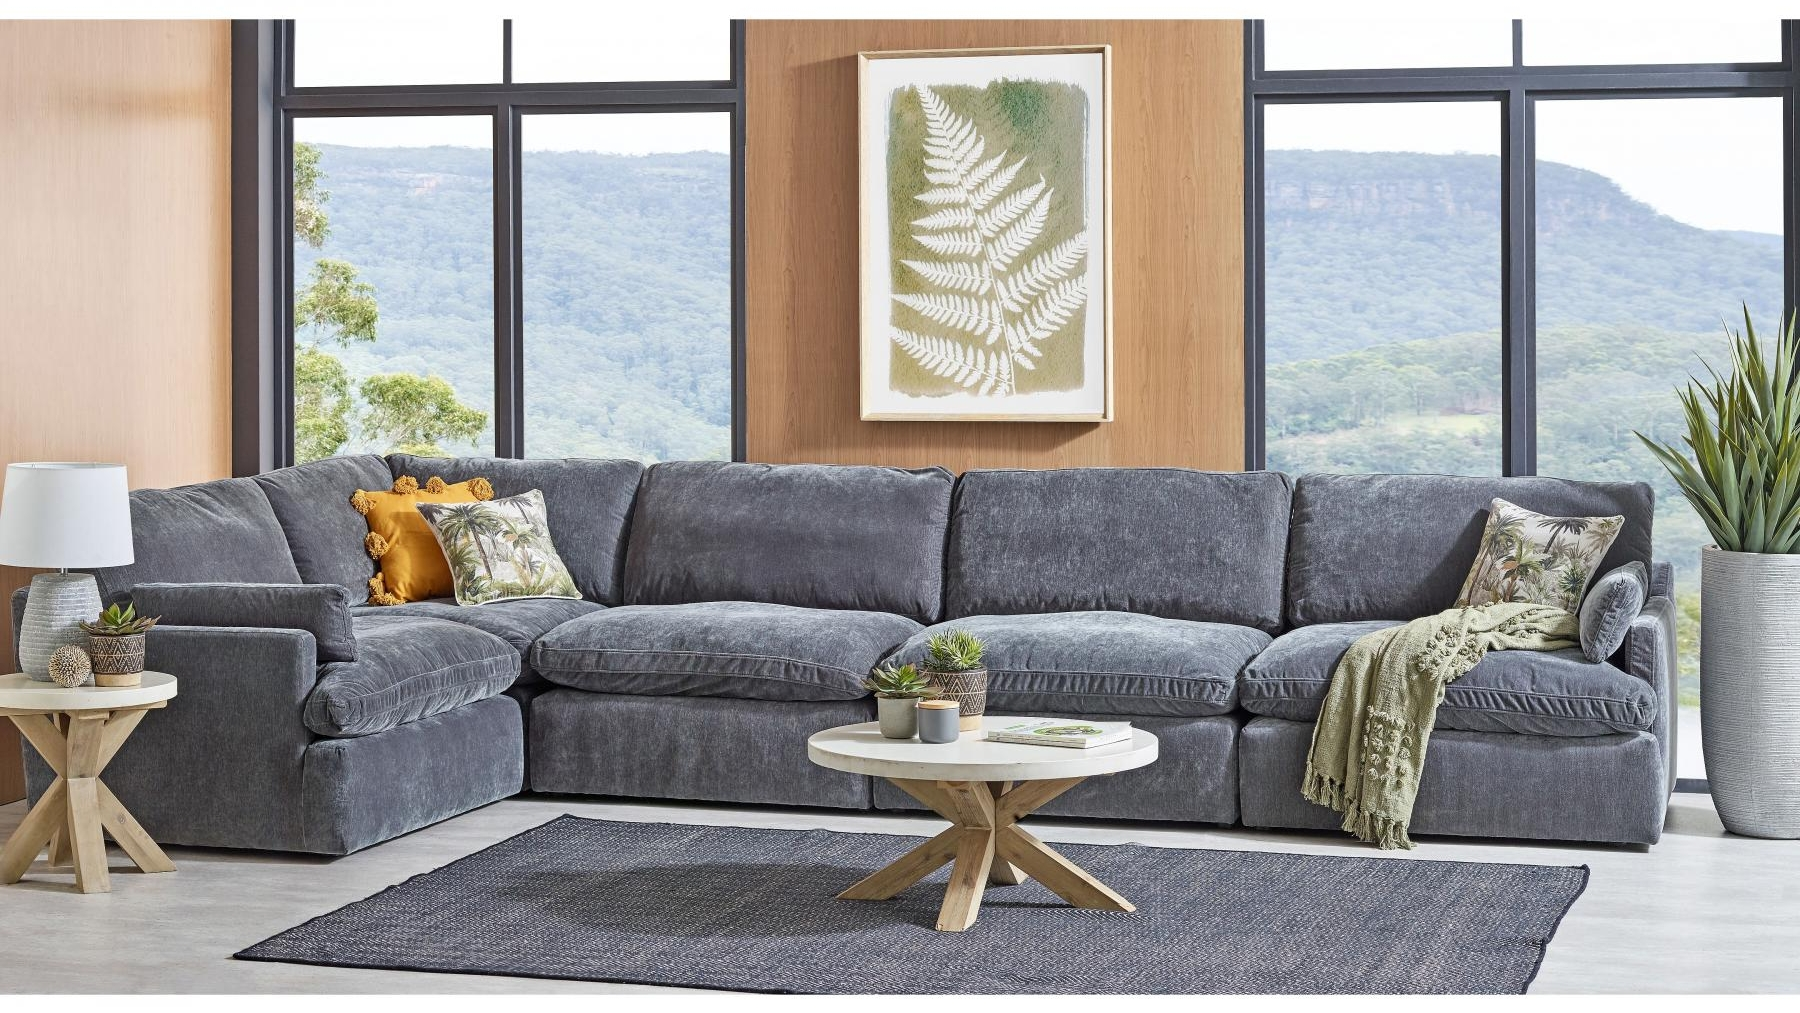 Buy Tate 5 Seater Fabric Modular Lounge Suite Harvey Norman Au